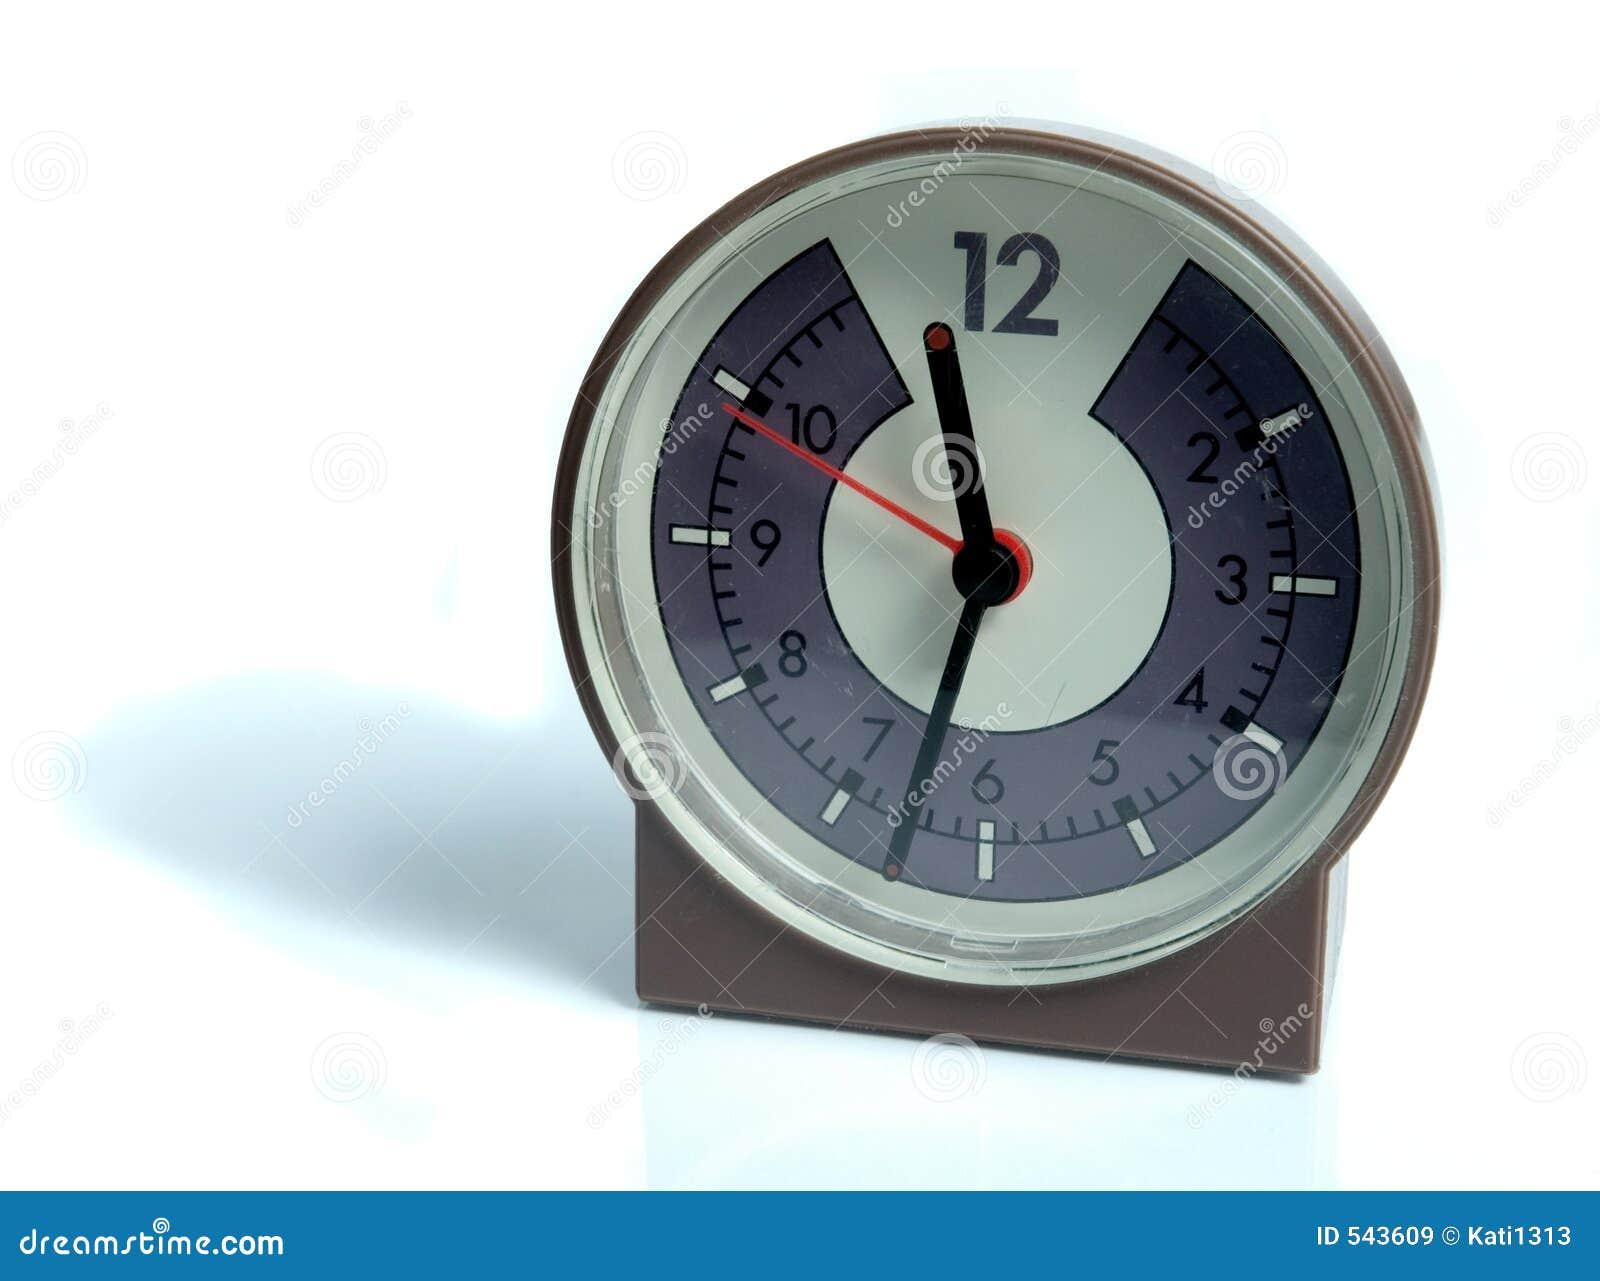 Download 减速火箭的闹钟 库存图片. 图片 包括有 时钟, 编号, 苏醒, whitespace, 早晨, 对象, 环形 - 543609